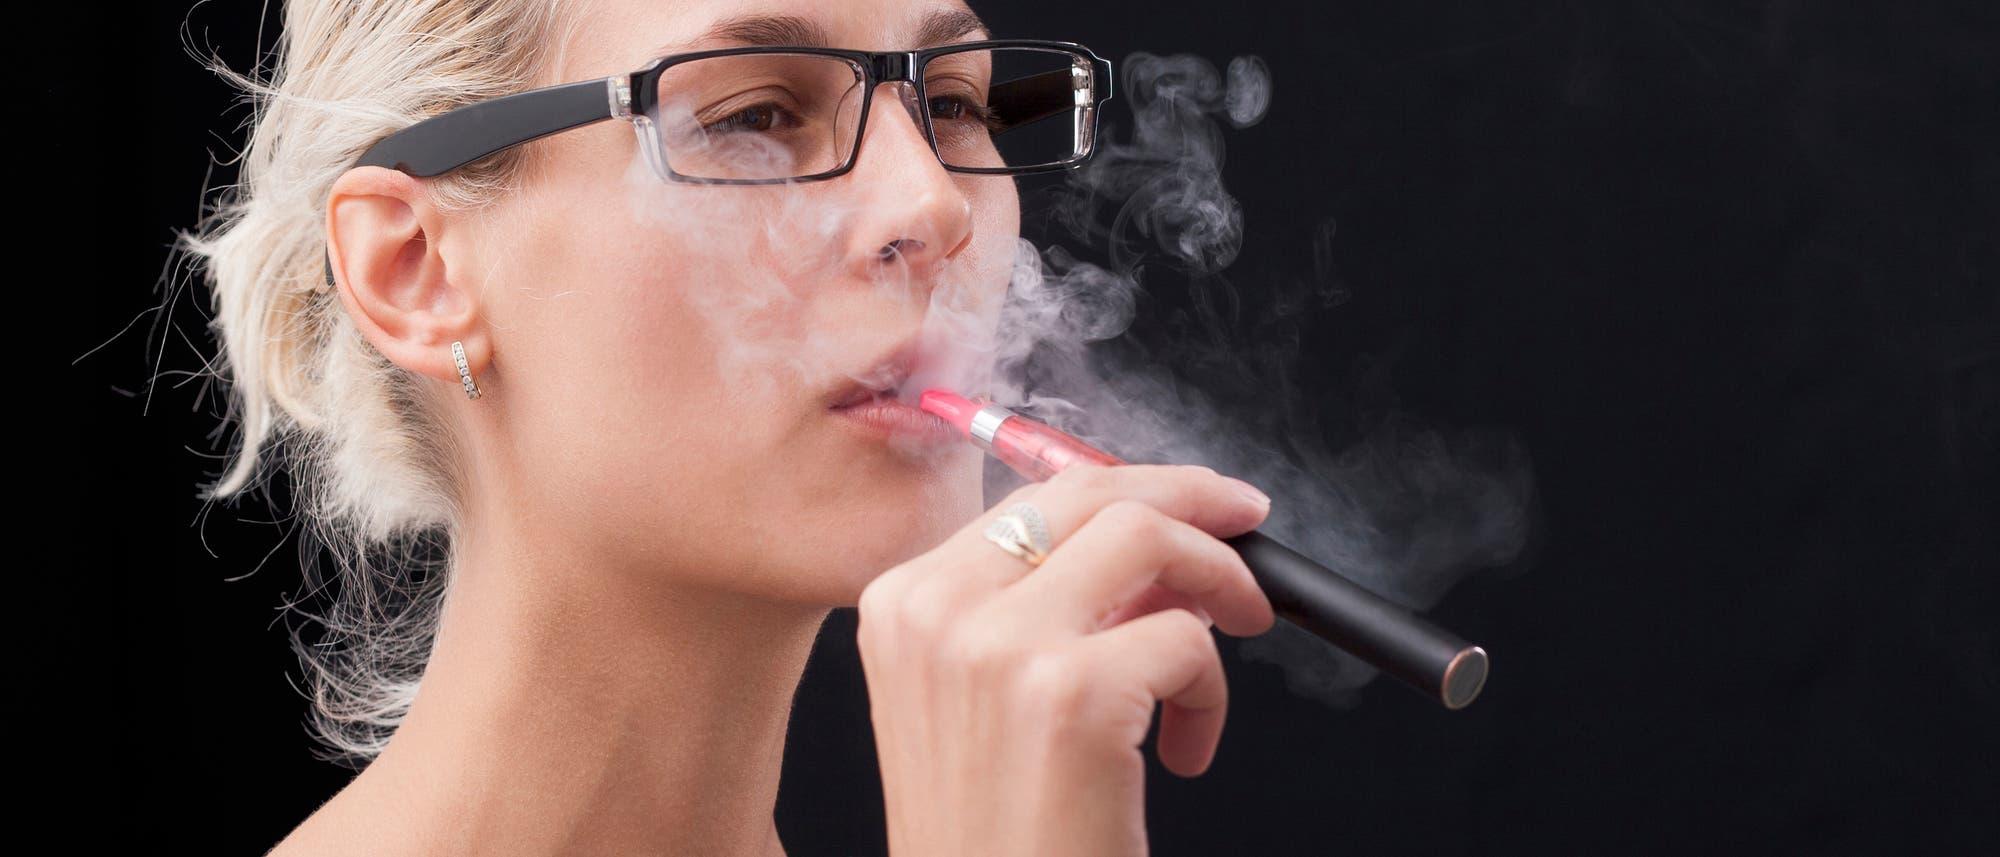 E-Zigarette rauchende Frau